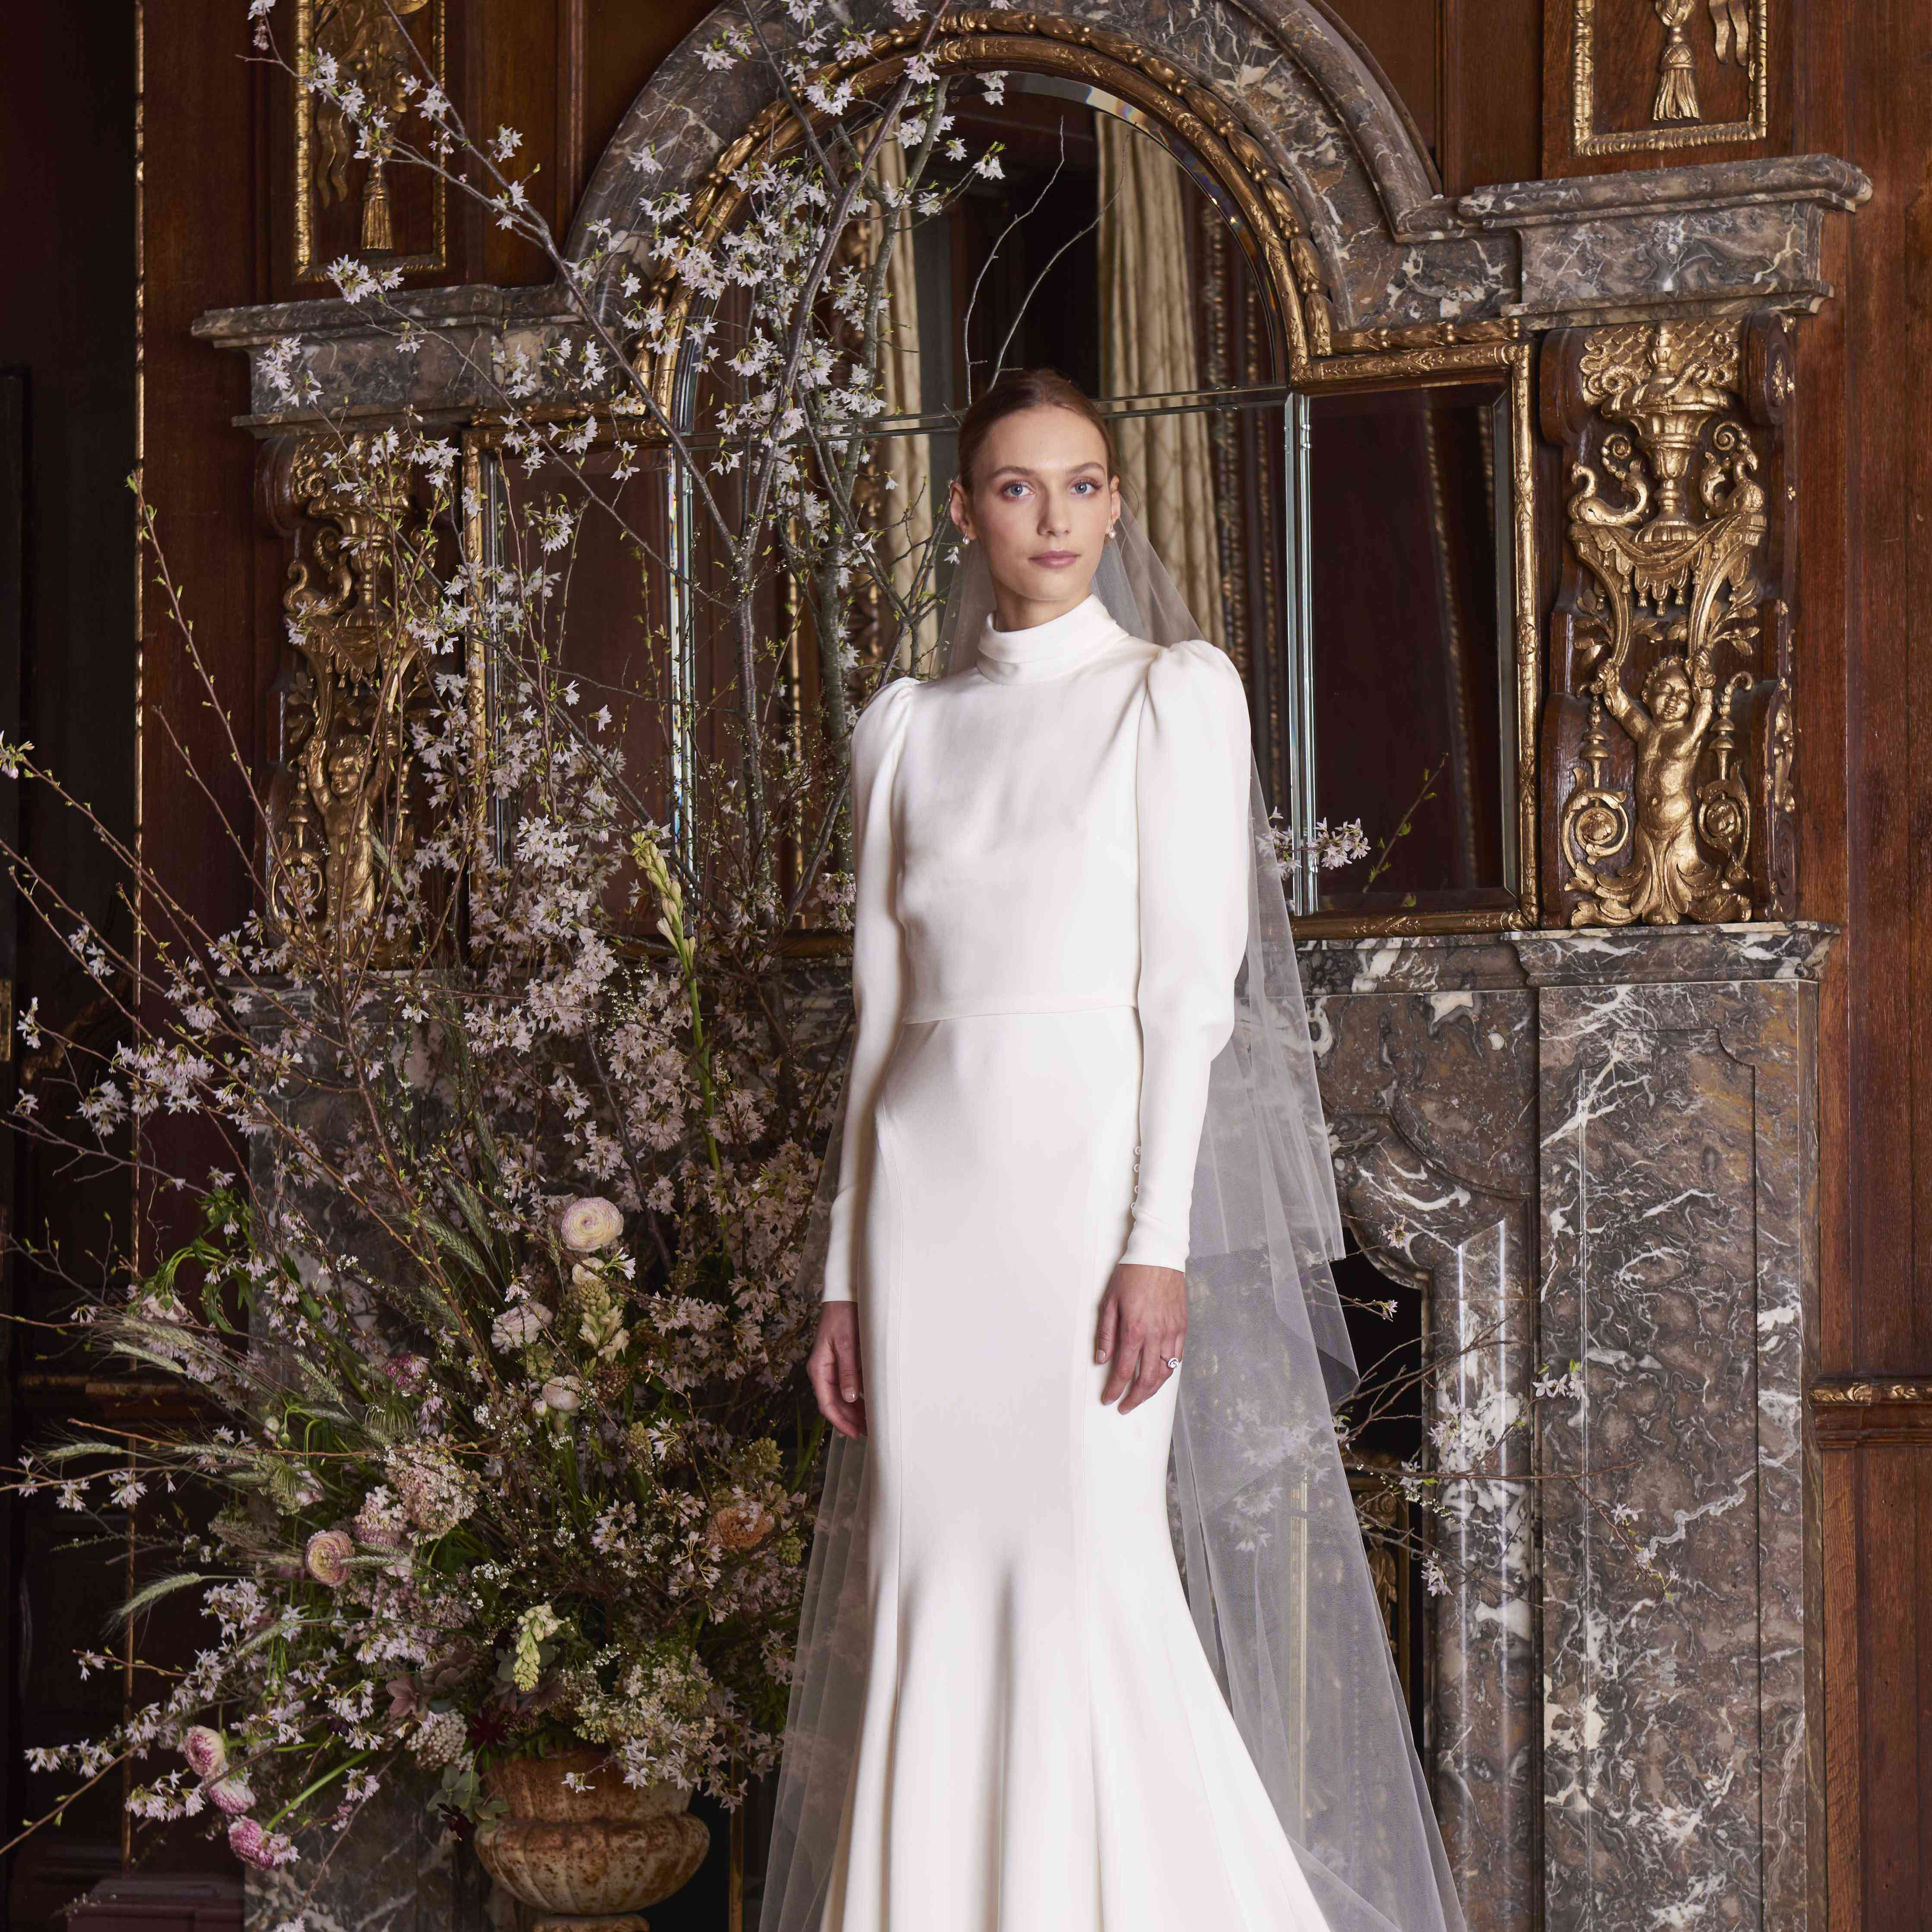 The Top Wedding Dress Trends Of 2019